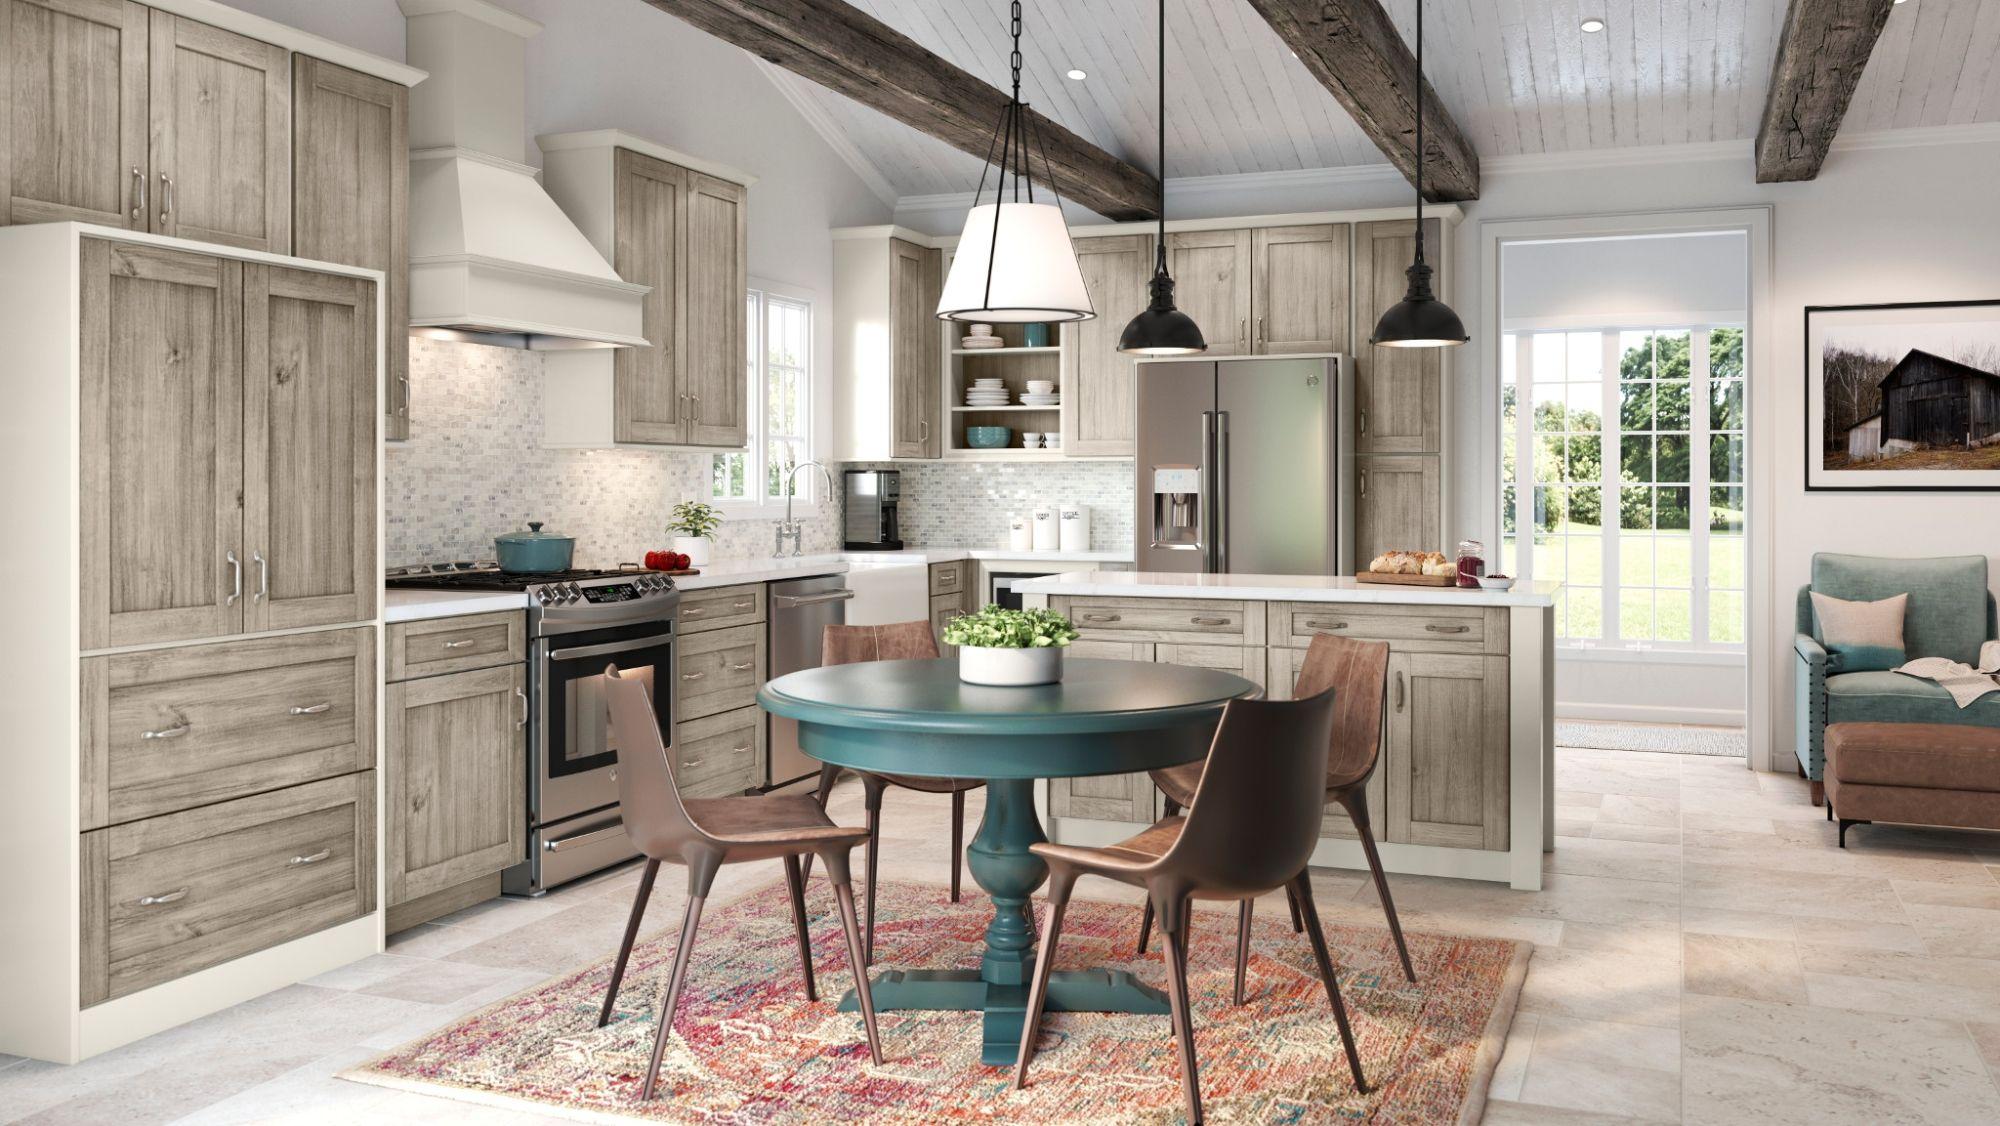 Shenandoah Cabinets - Mission | Dream kitchen in 2019 ...